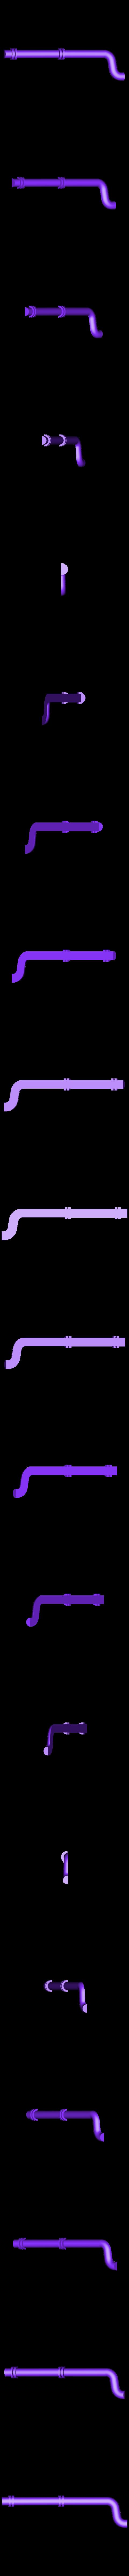 MirrorSteam_Pipe_-_Back_Engine-C.STL Download free STL file 4-8-8-4 Big Boy Locomotive • 3D printer object, RaymondDeLuca